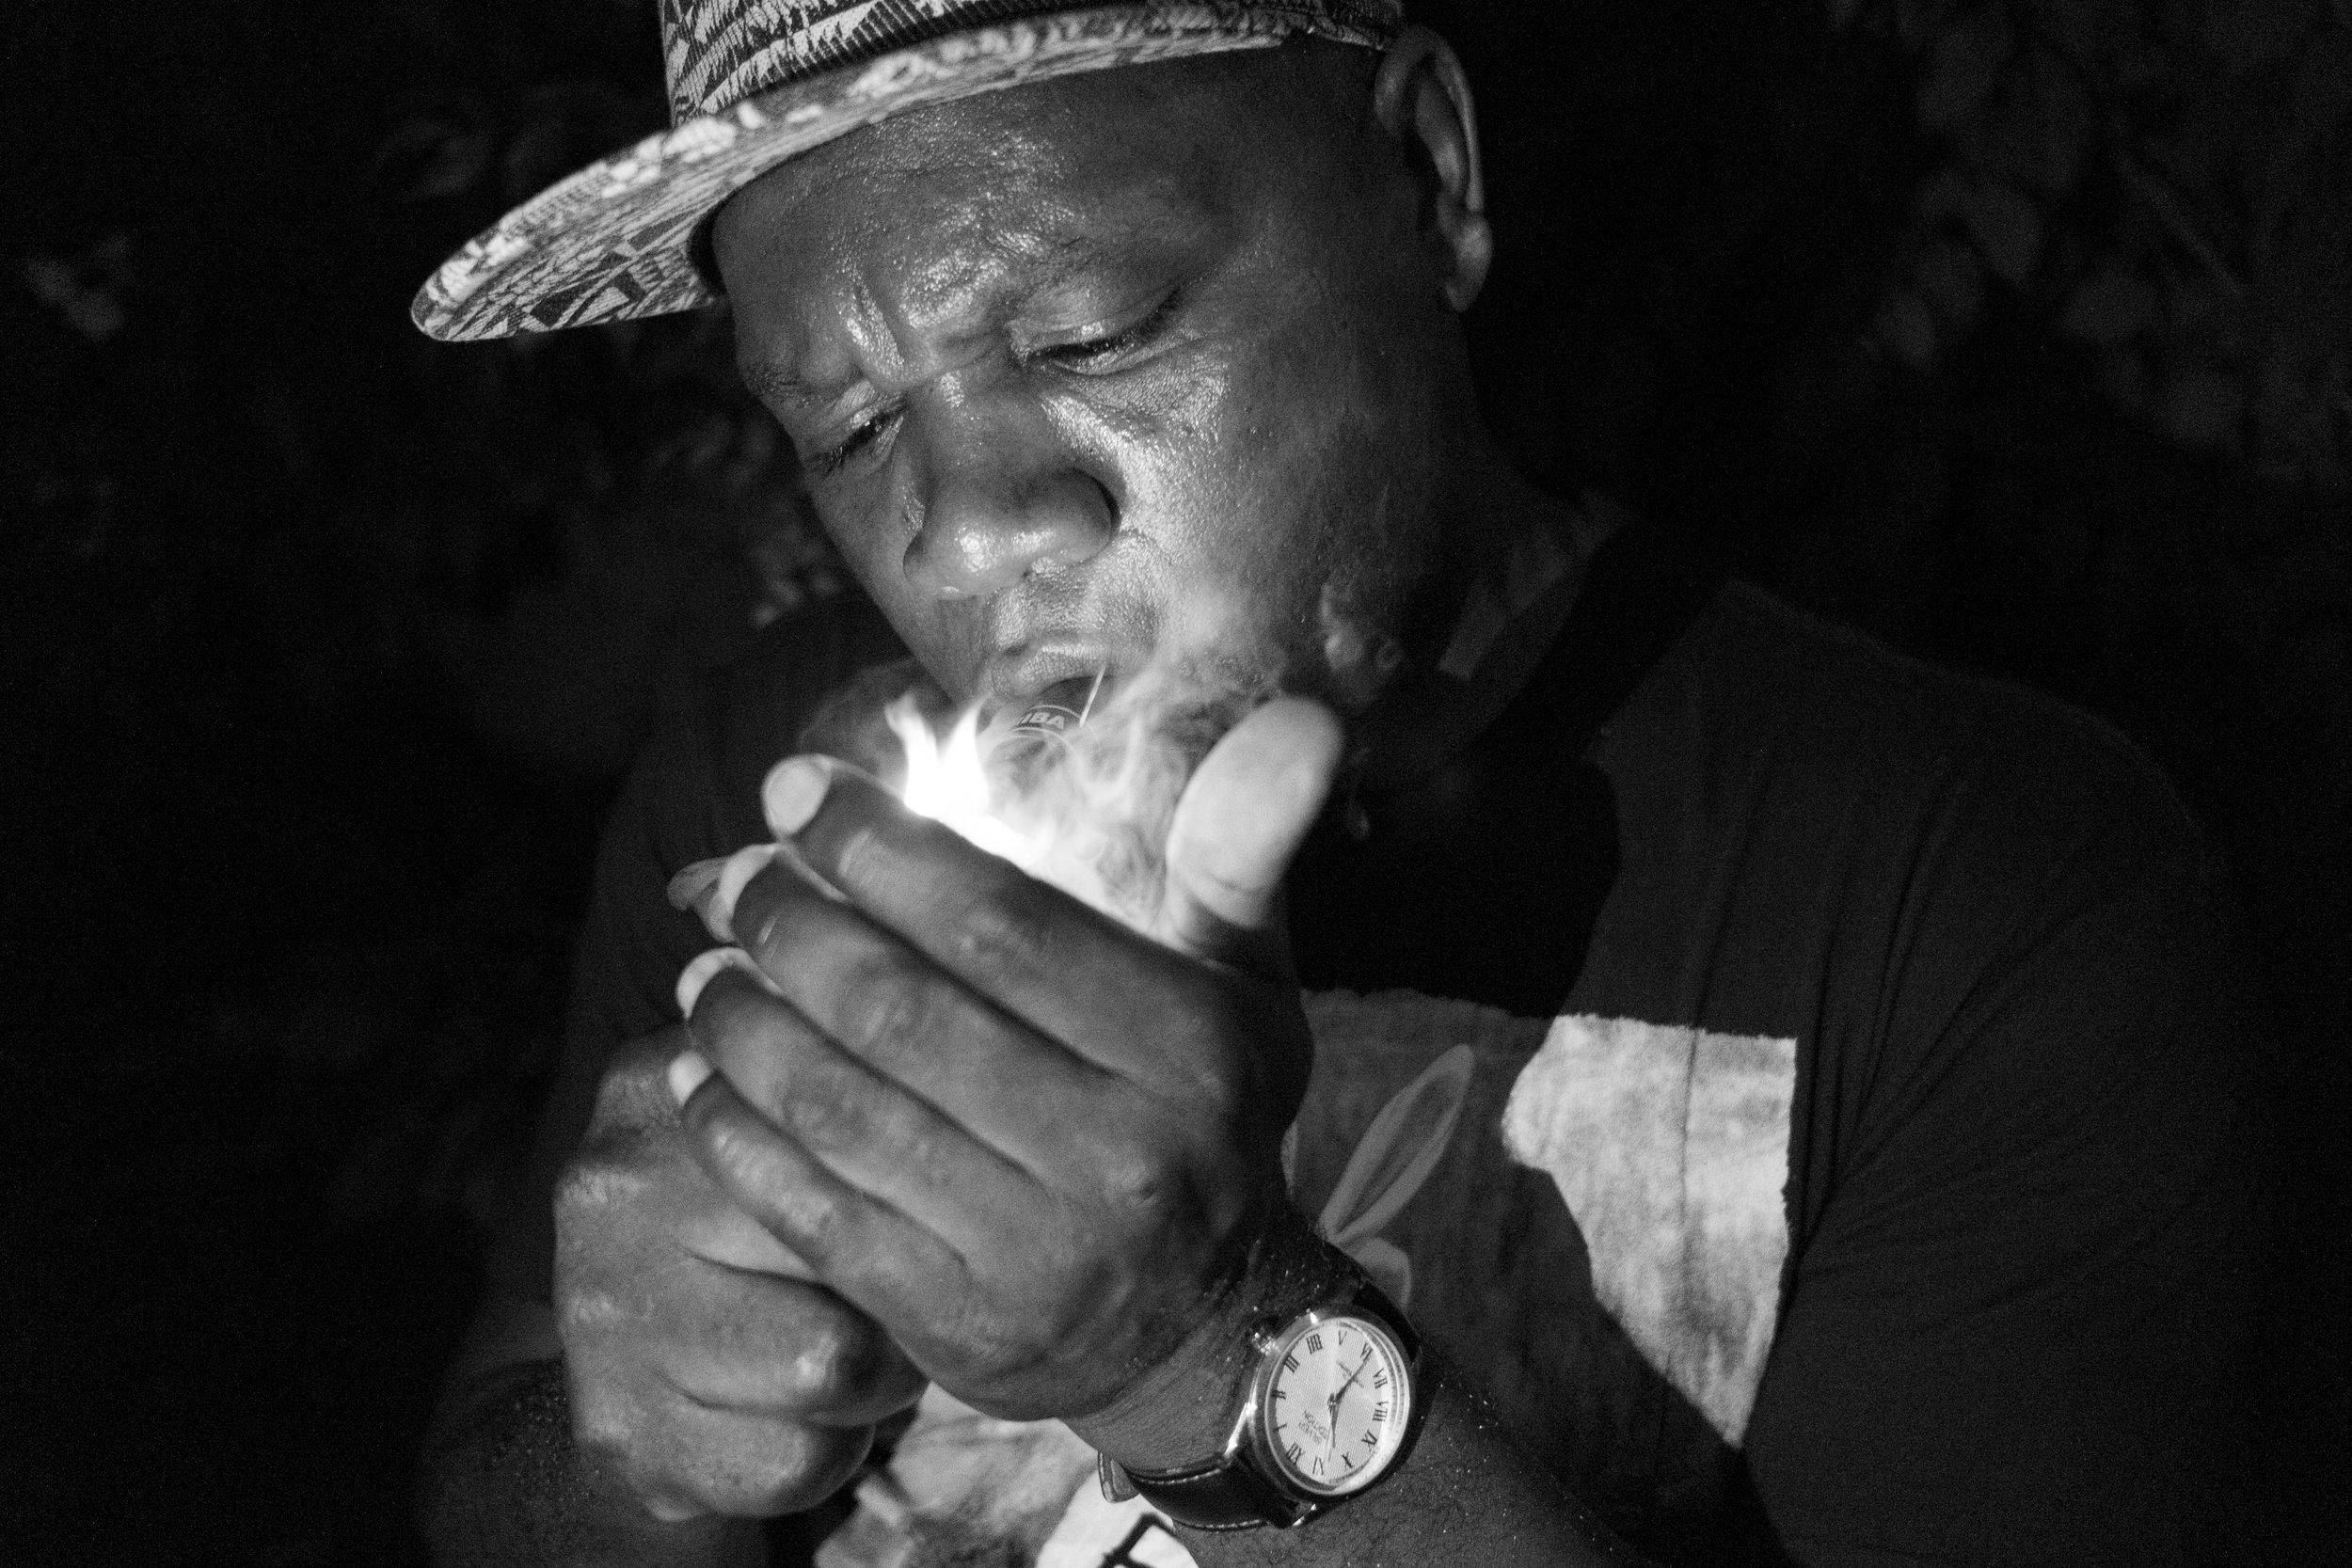 nelson with cigar.jpg